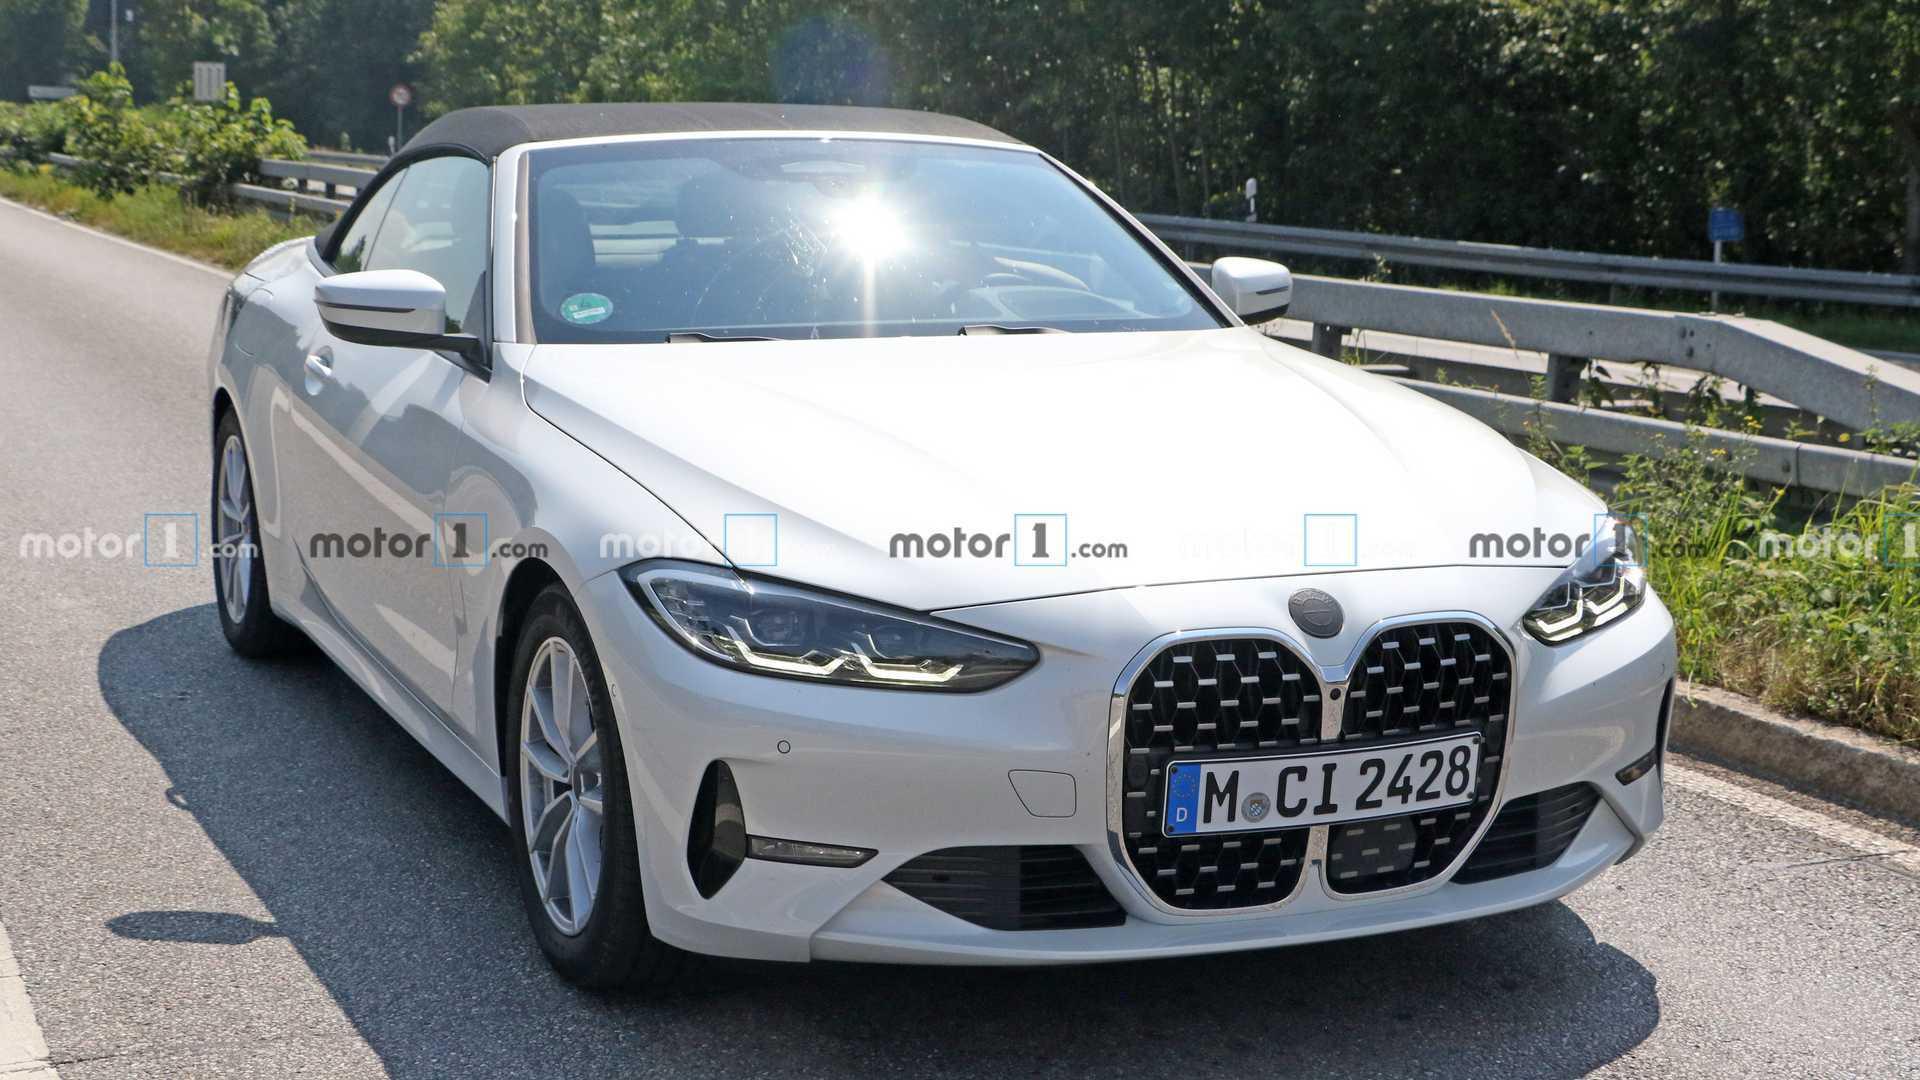 2020 - [BMW] Série 4 Coupé/Cabriolet G23-G22 - Page 16 New-bmw-4-series-convertible-front